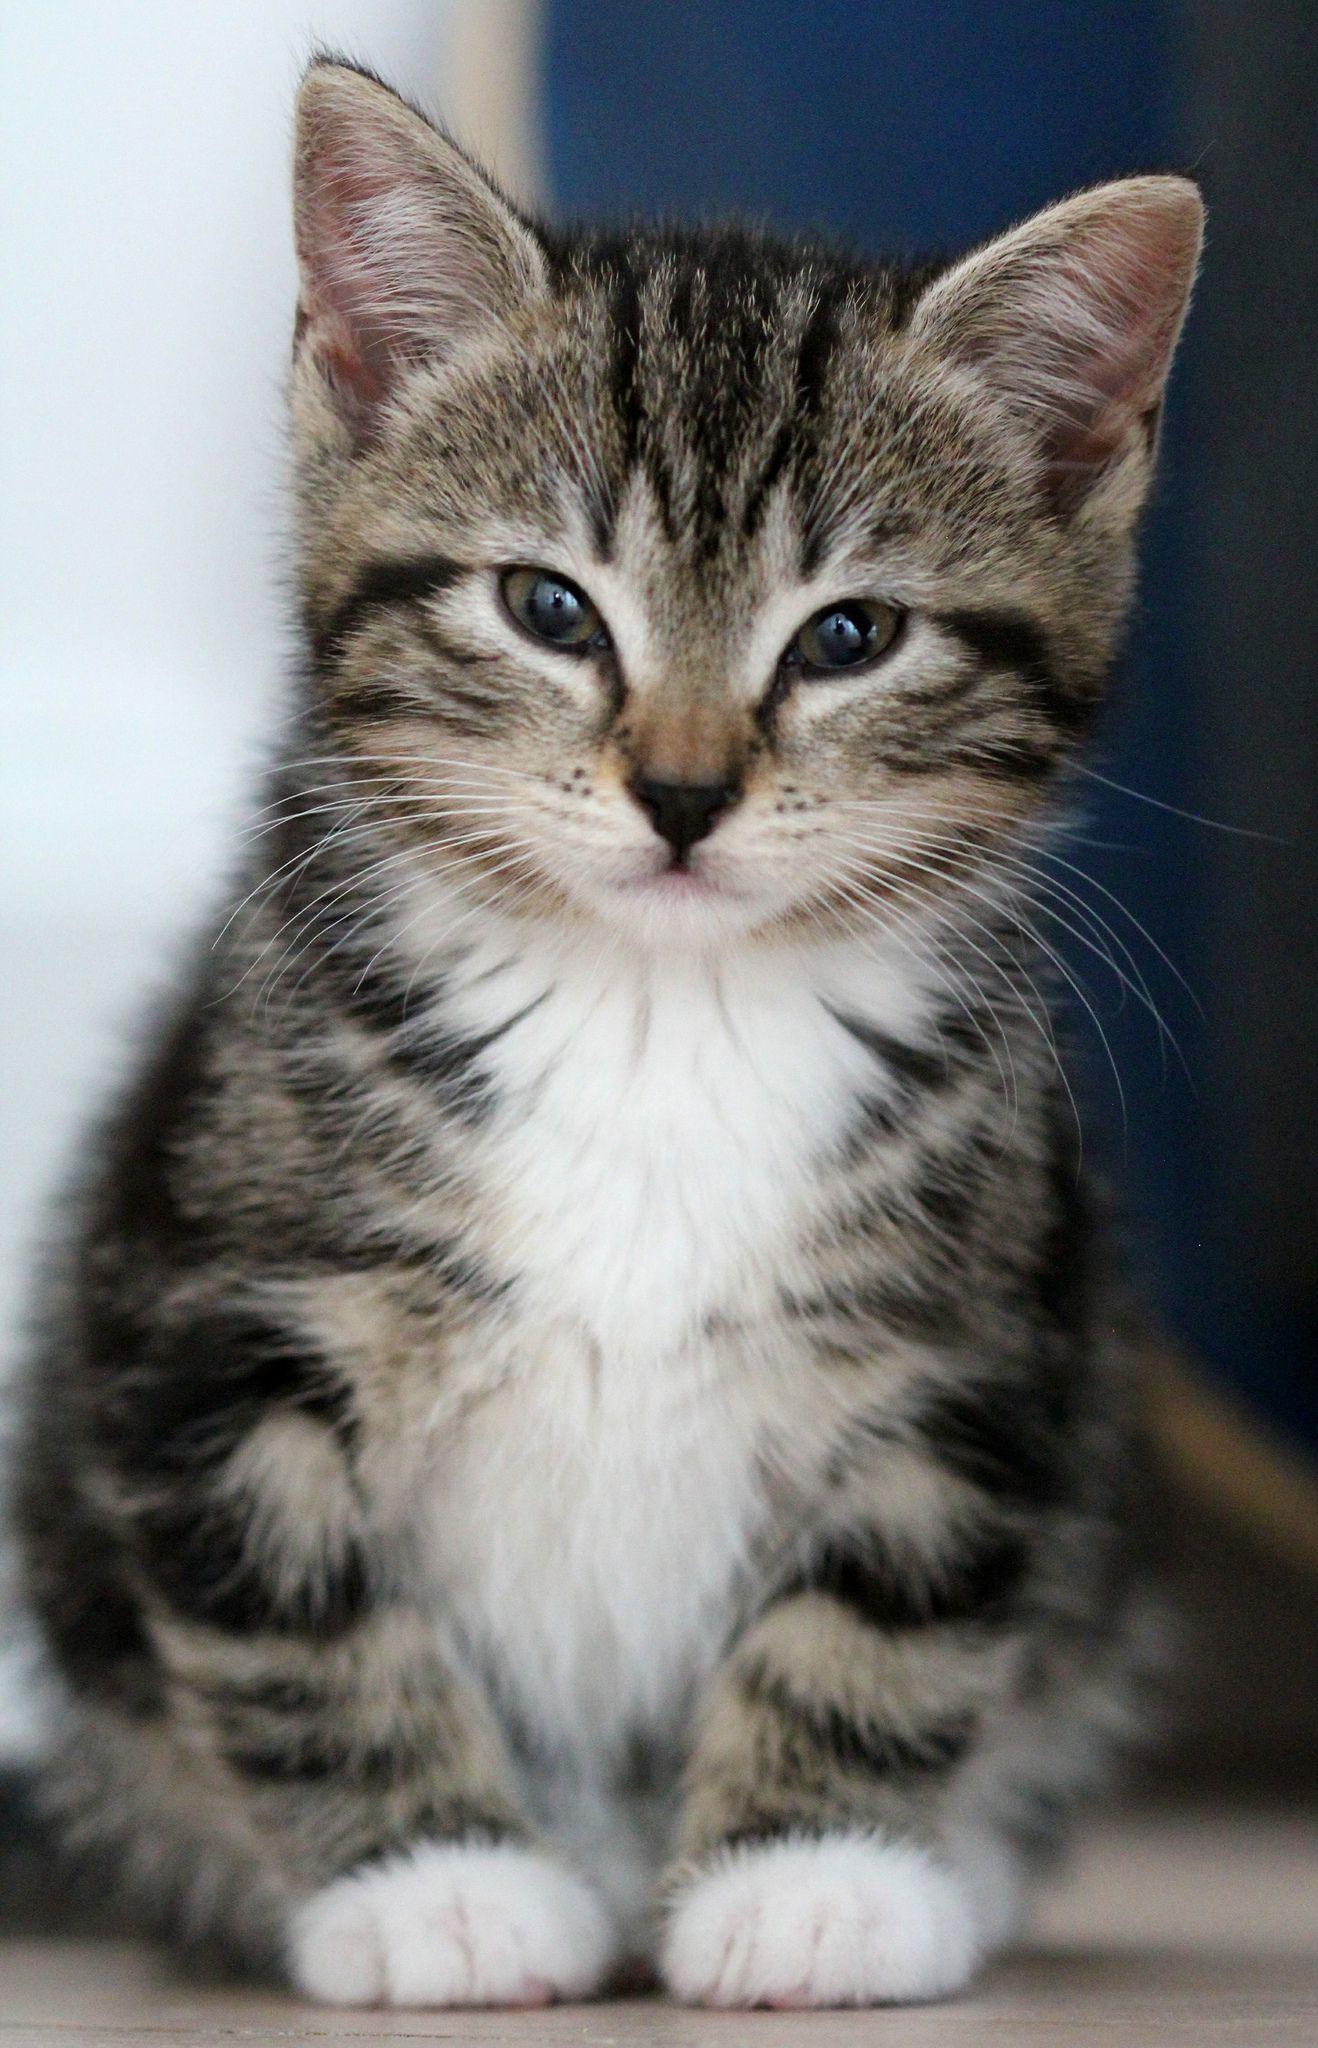 Kitten Kittens cutest, Kittens, Beautiful cats